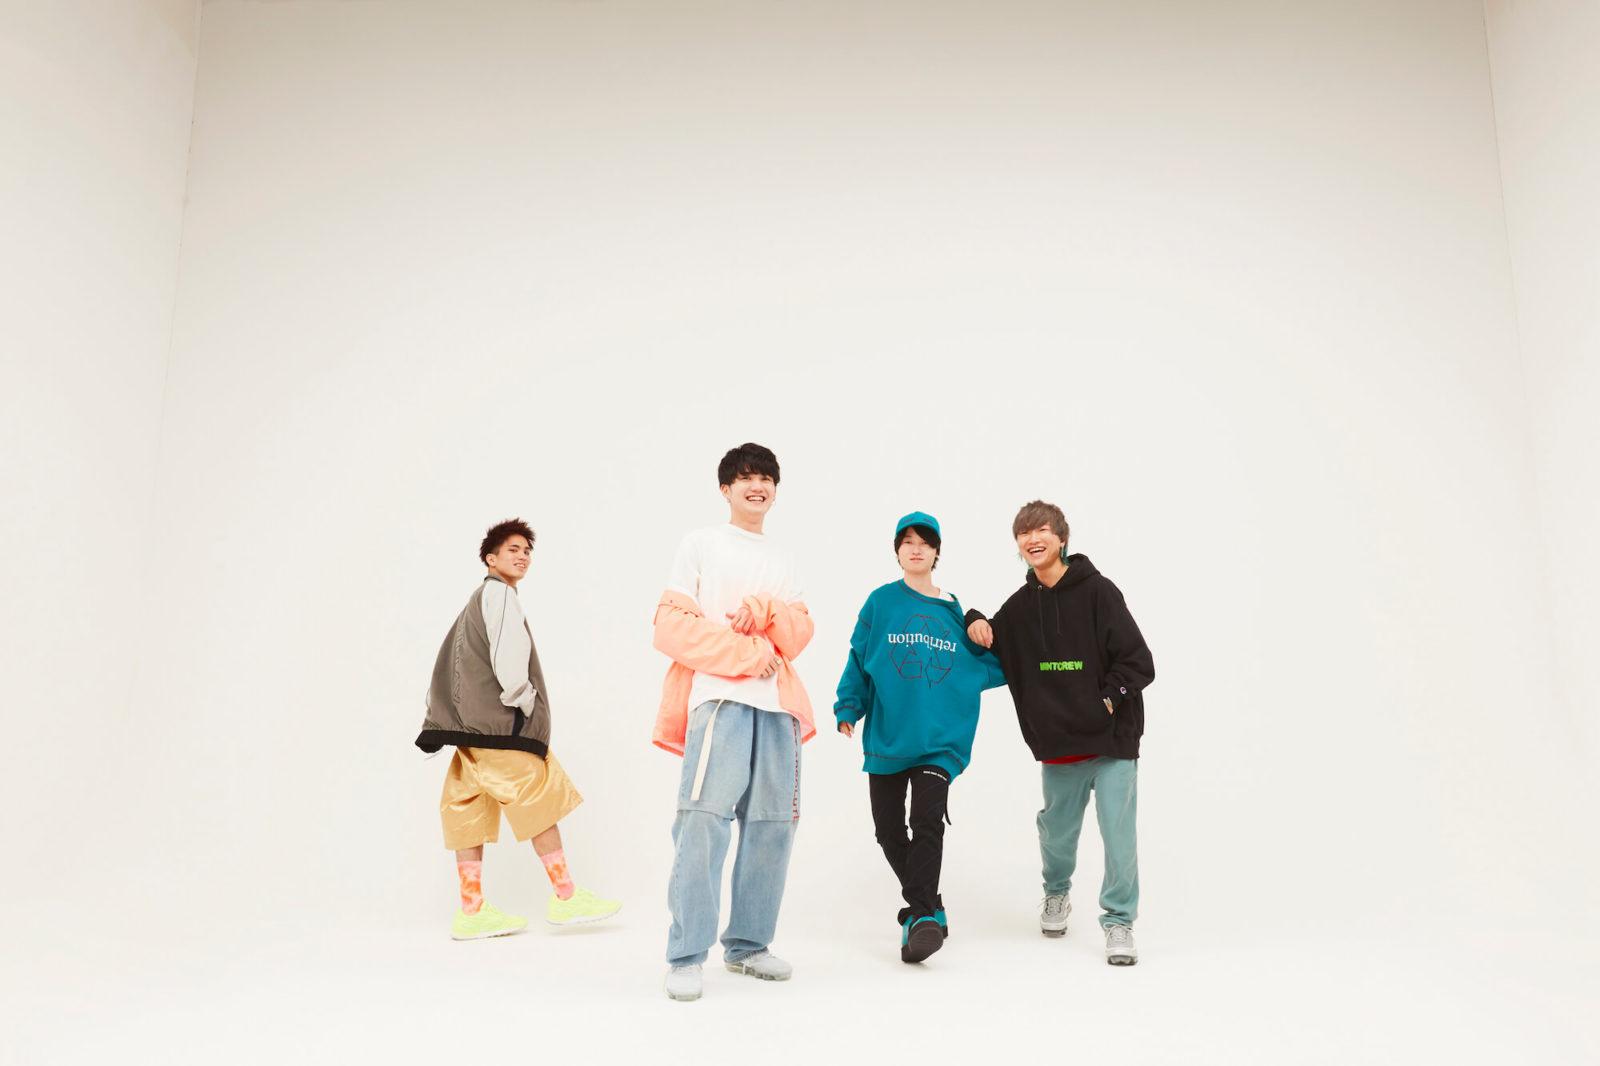 ACE COLLECTION 初デジタルアルバム「December 9」リリース&MV公開サムネイル画像